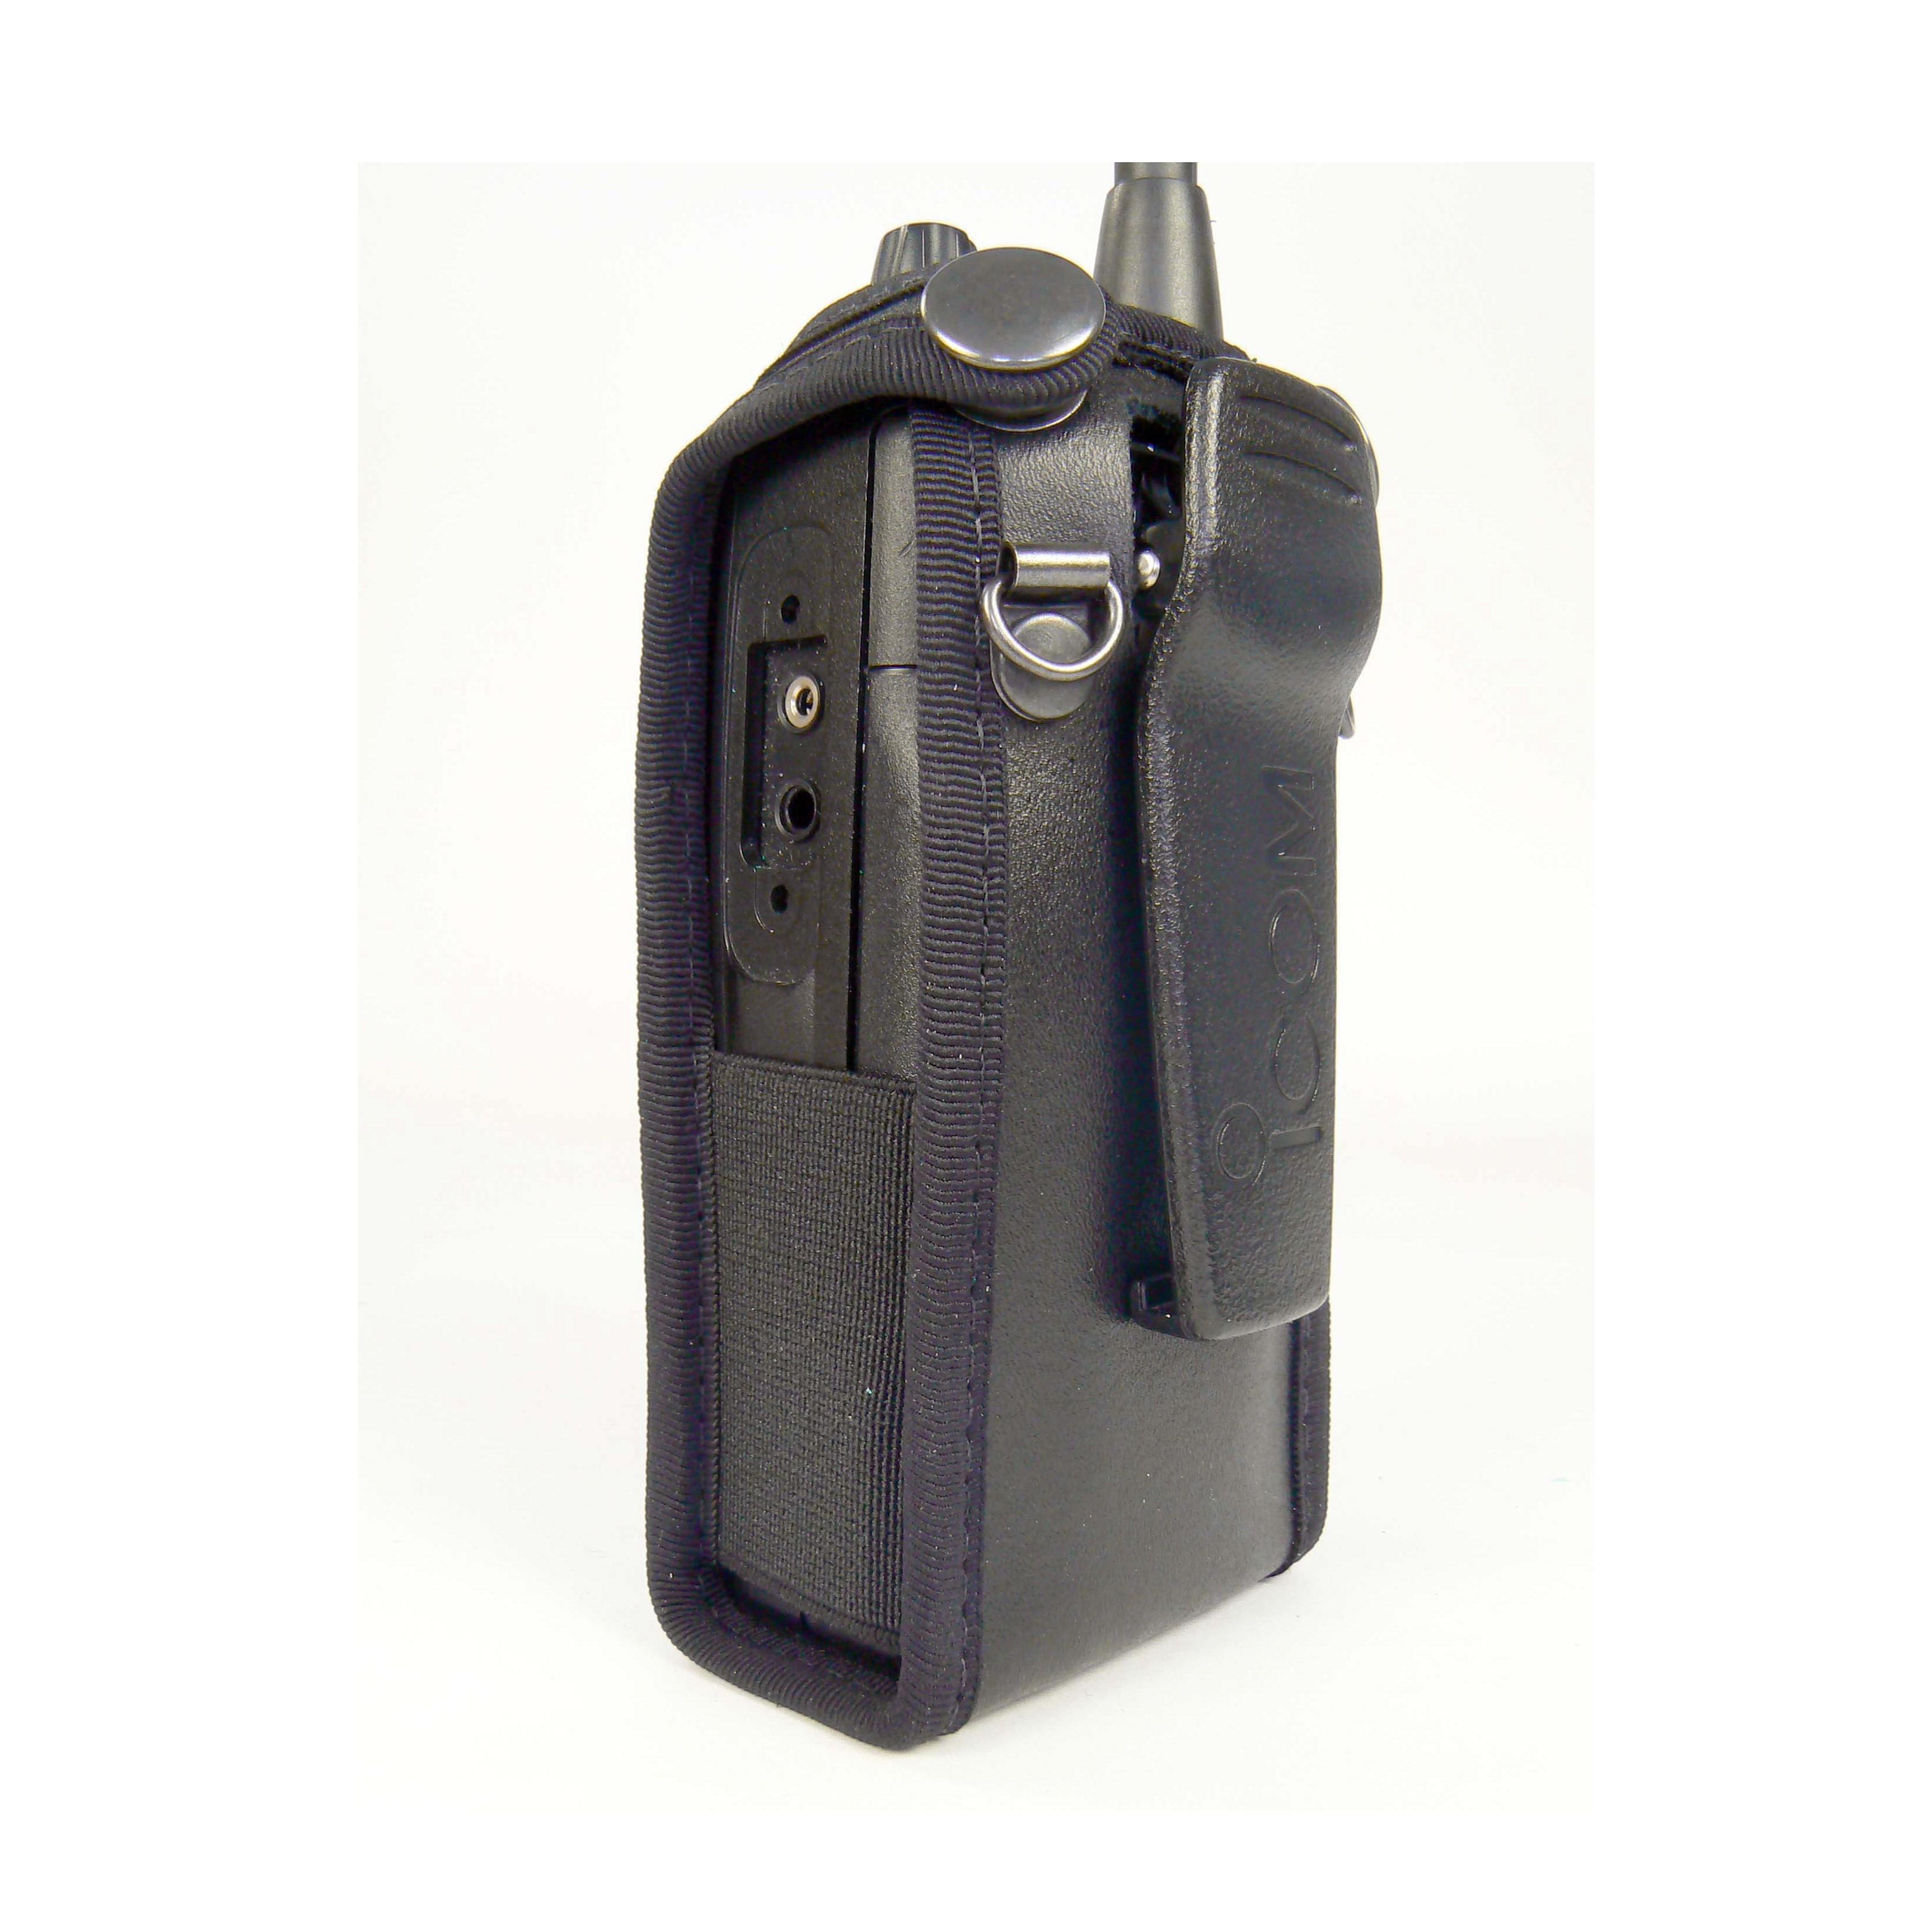 Icom F4029 Radio Case Leather